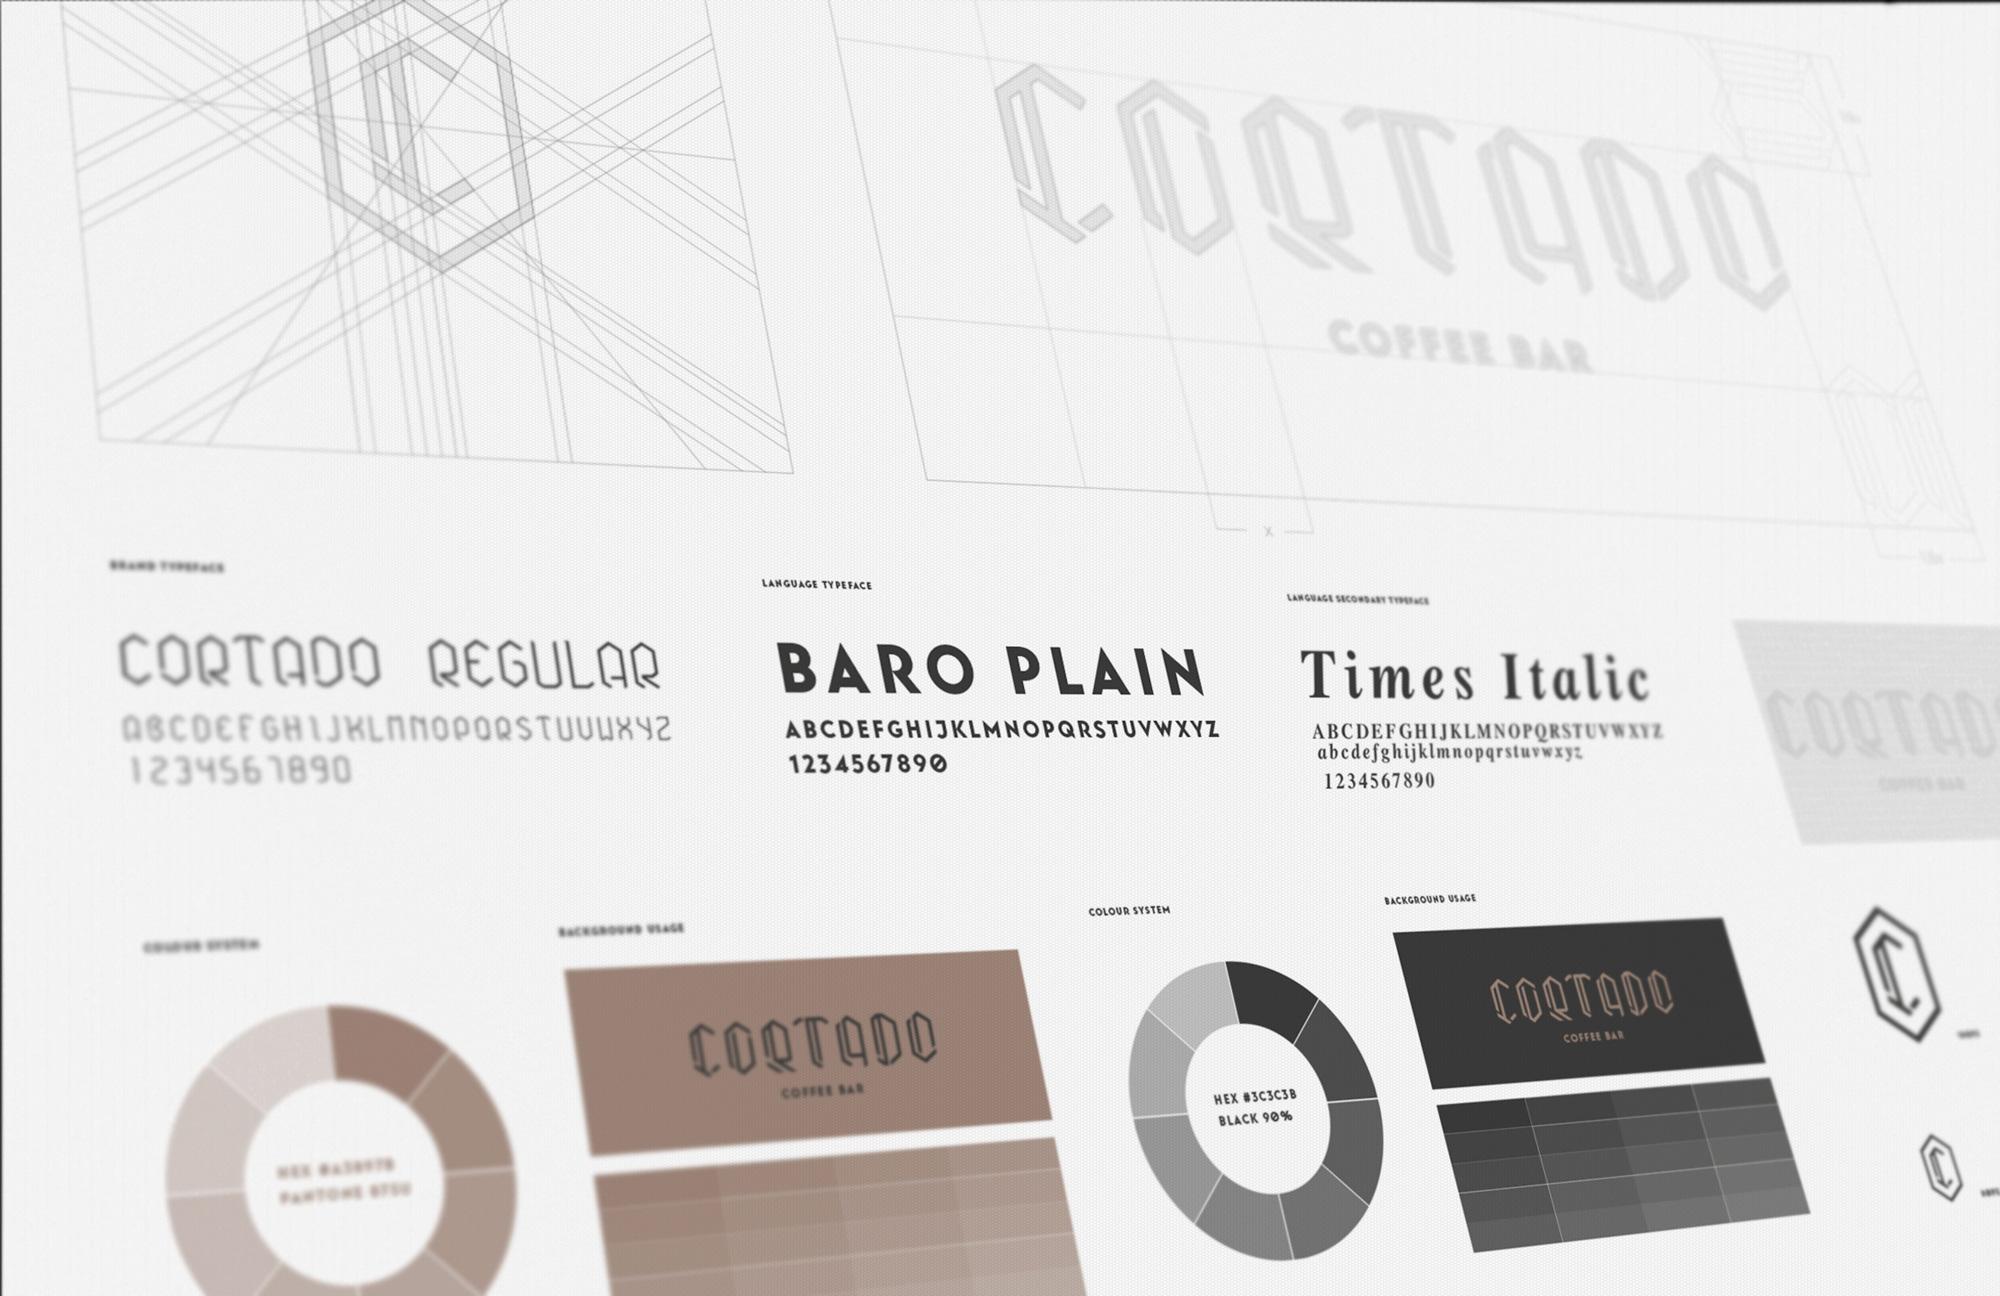 The Creative Union - Cortado Coffee Bar Branding1.jpg